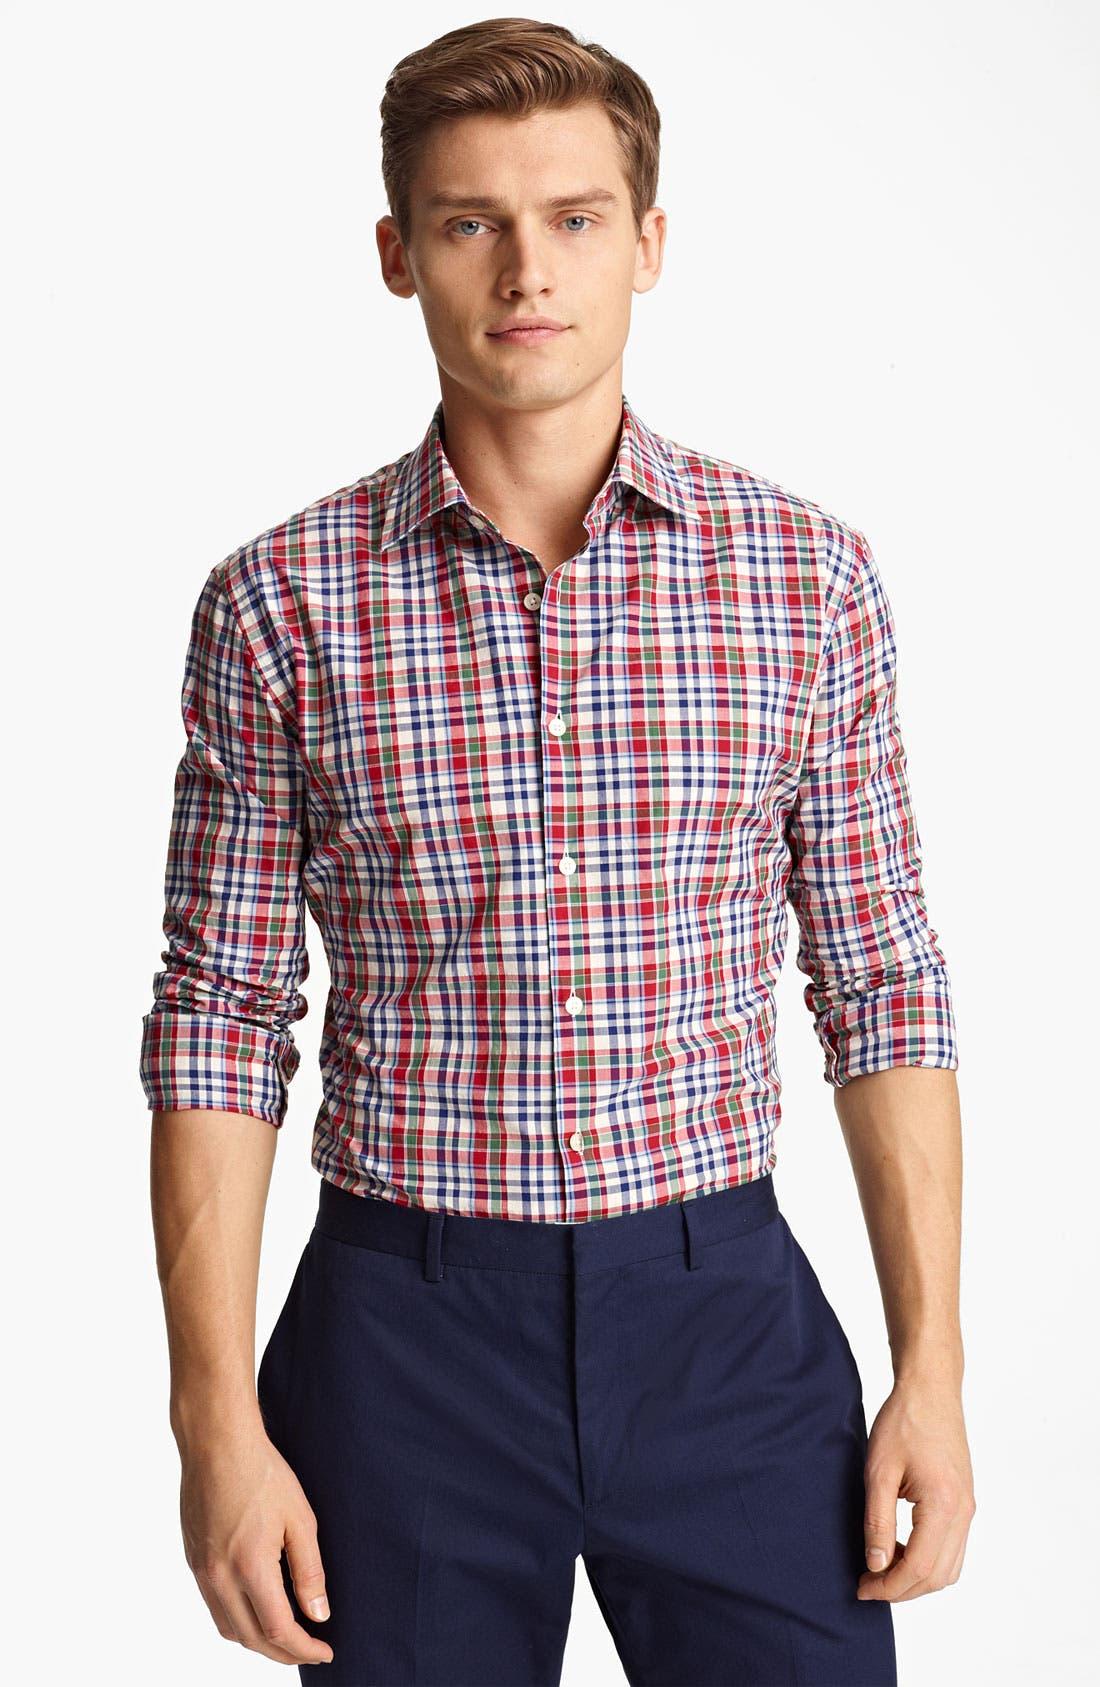 Alternate Image 1 Selected - Paul Smith London Tartan Plaid Shirt